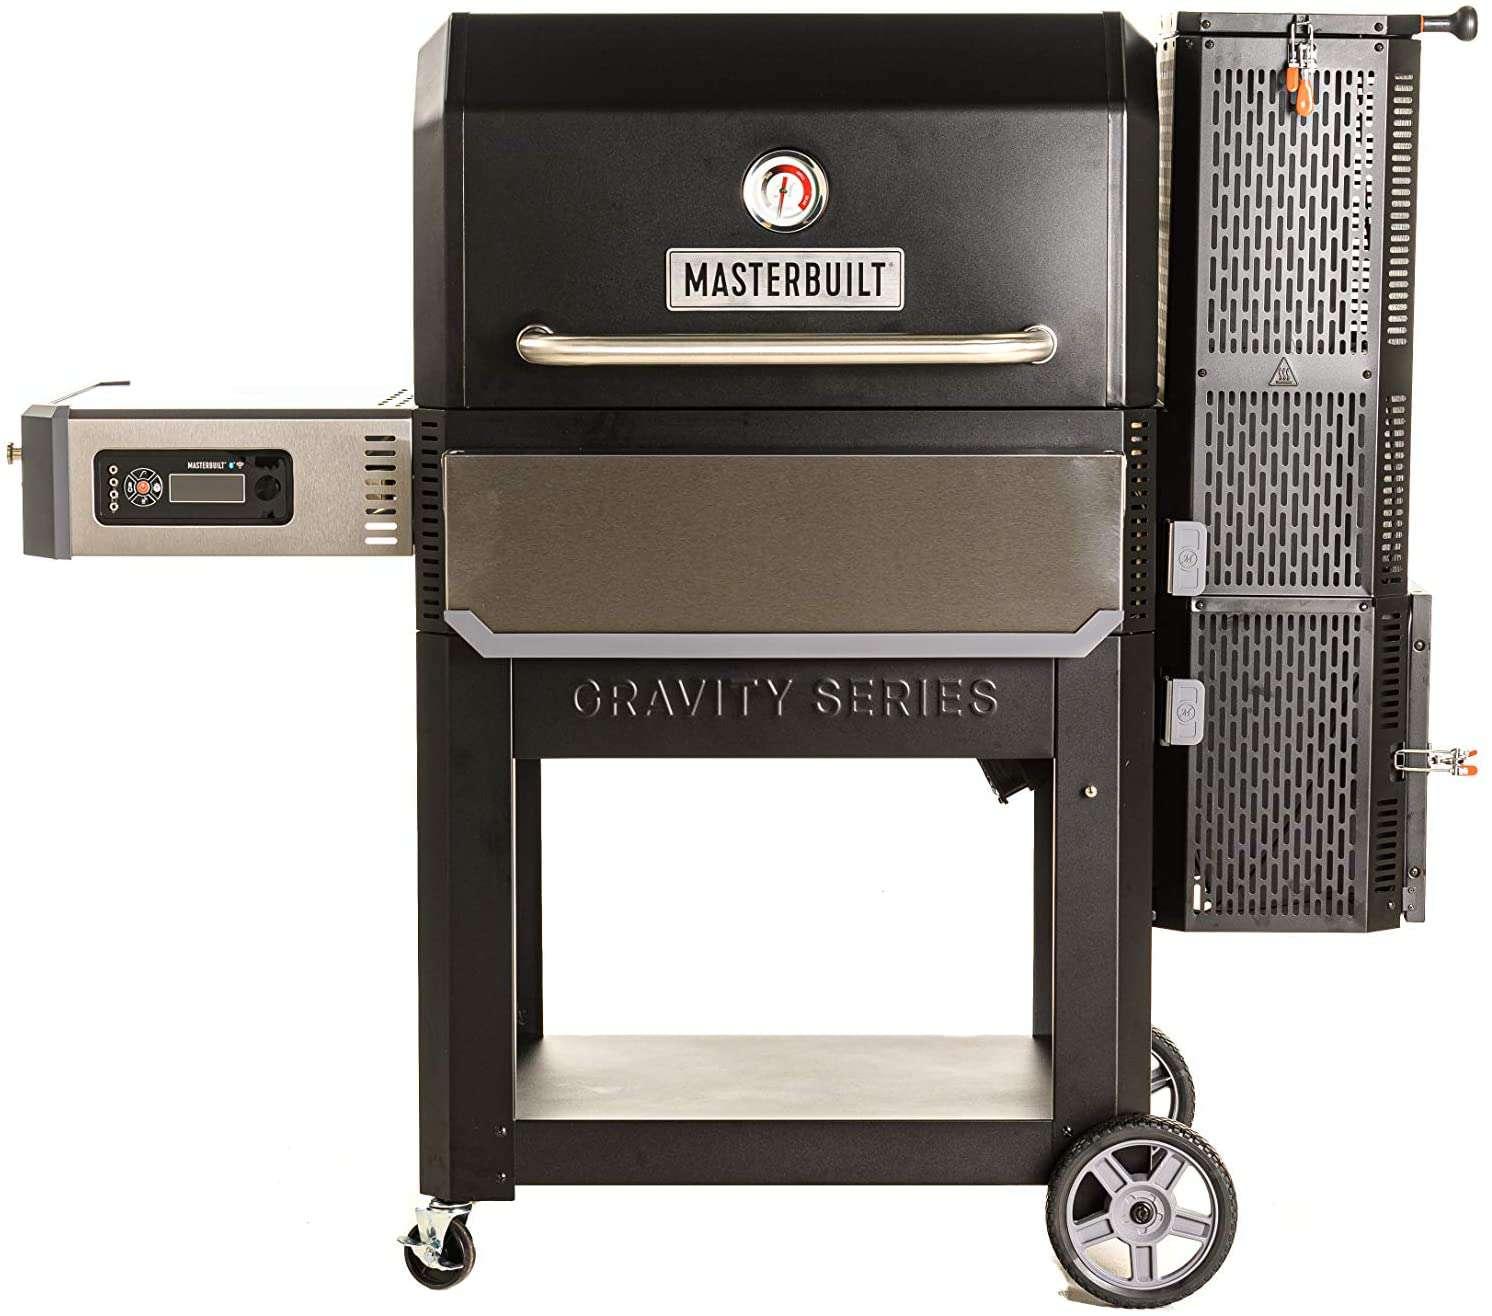 masterbuilt-1050-gravity-smoker